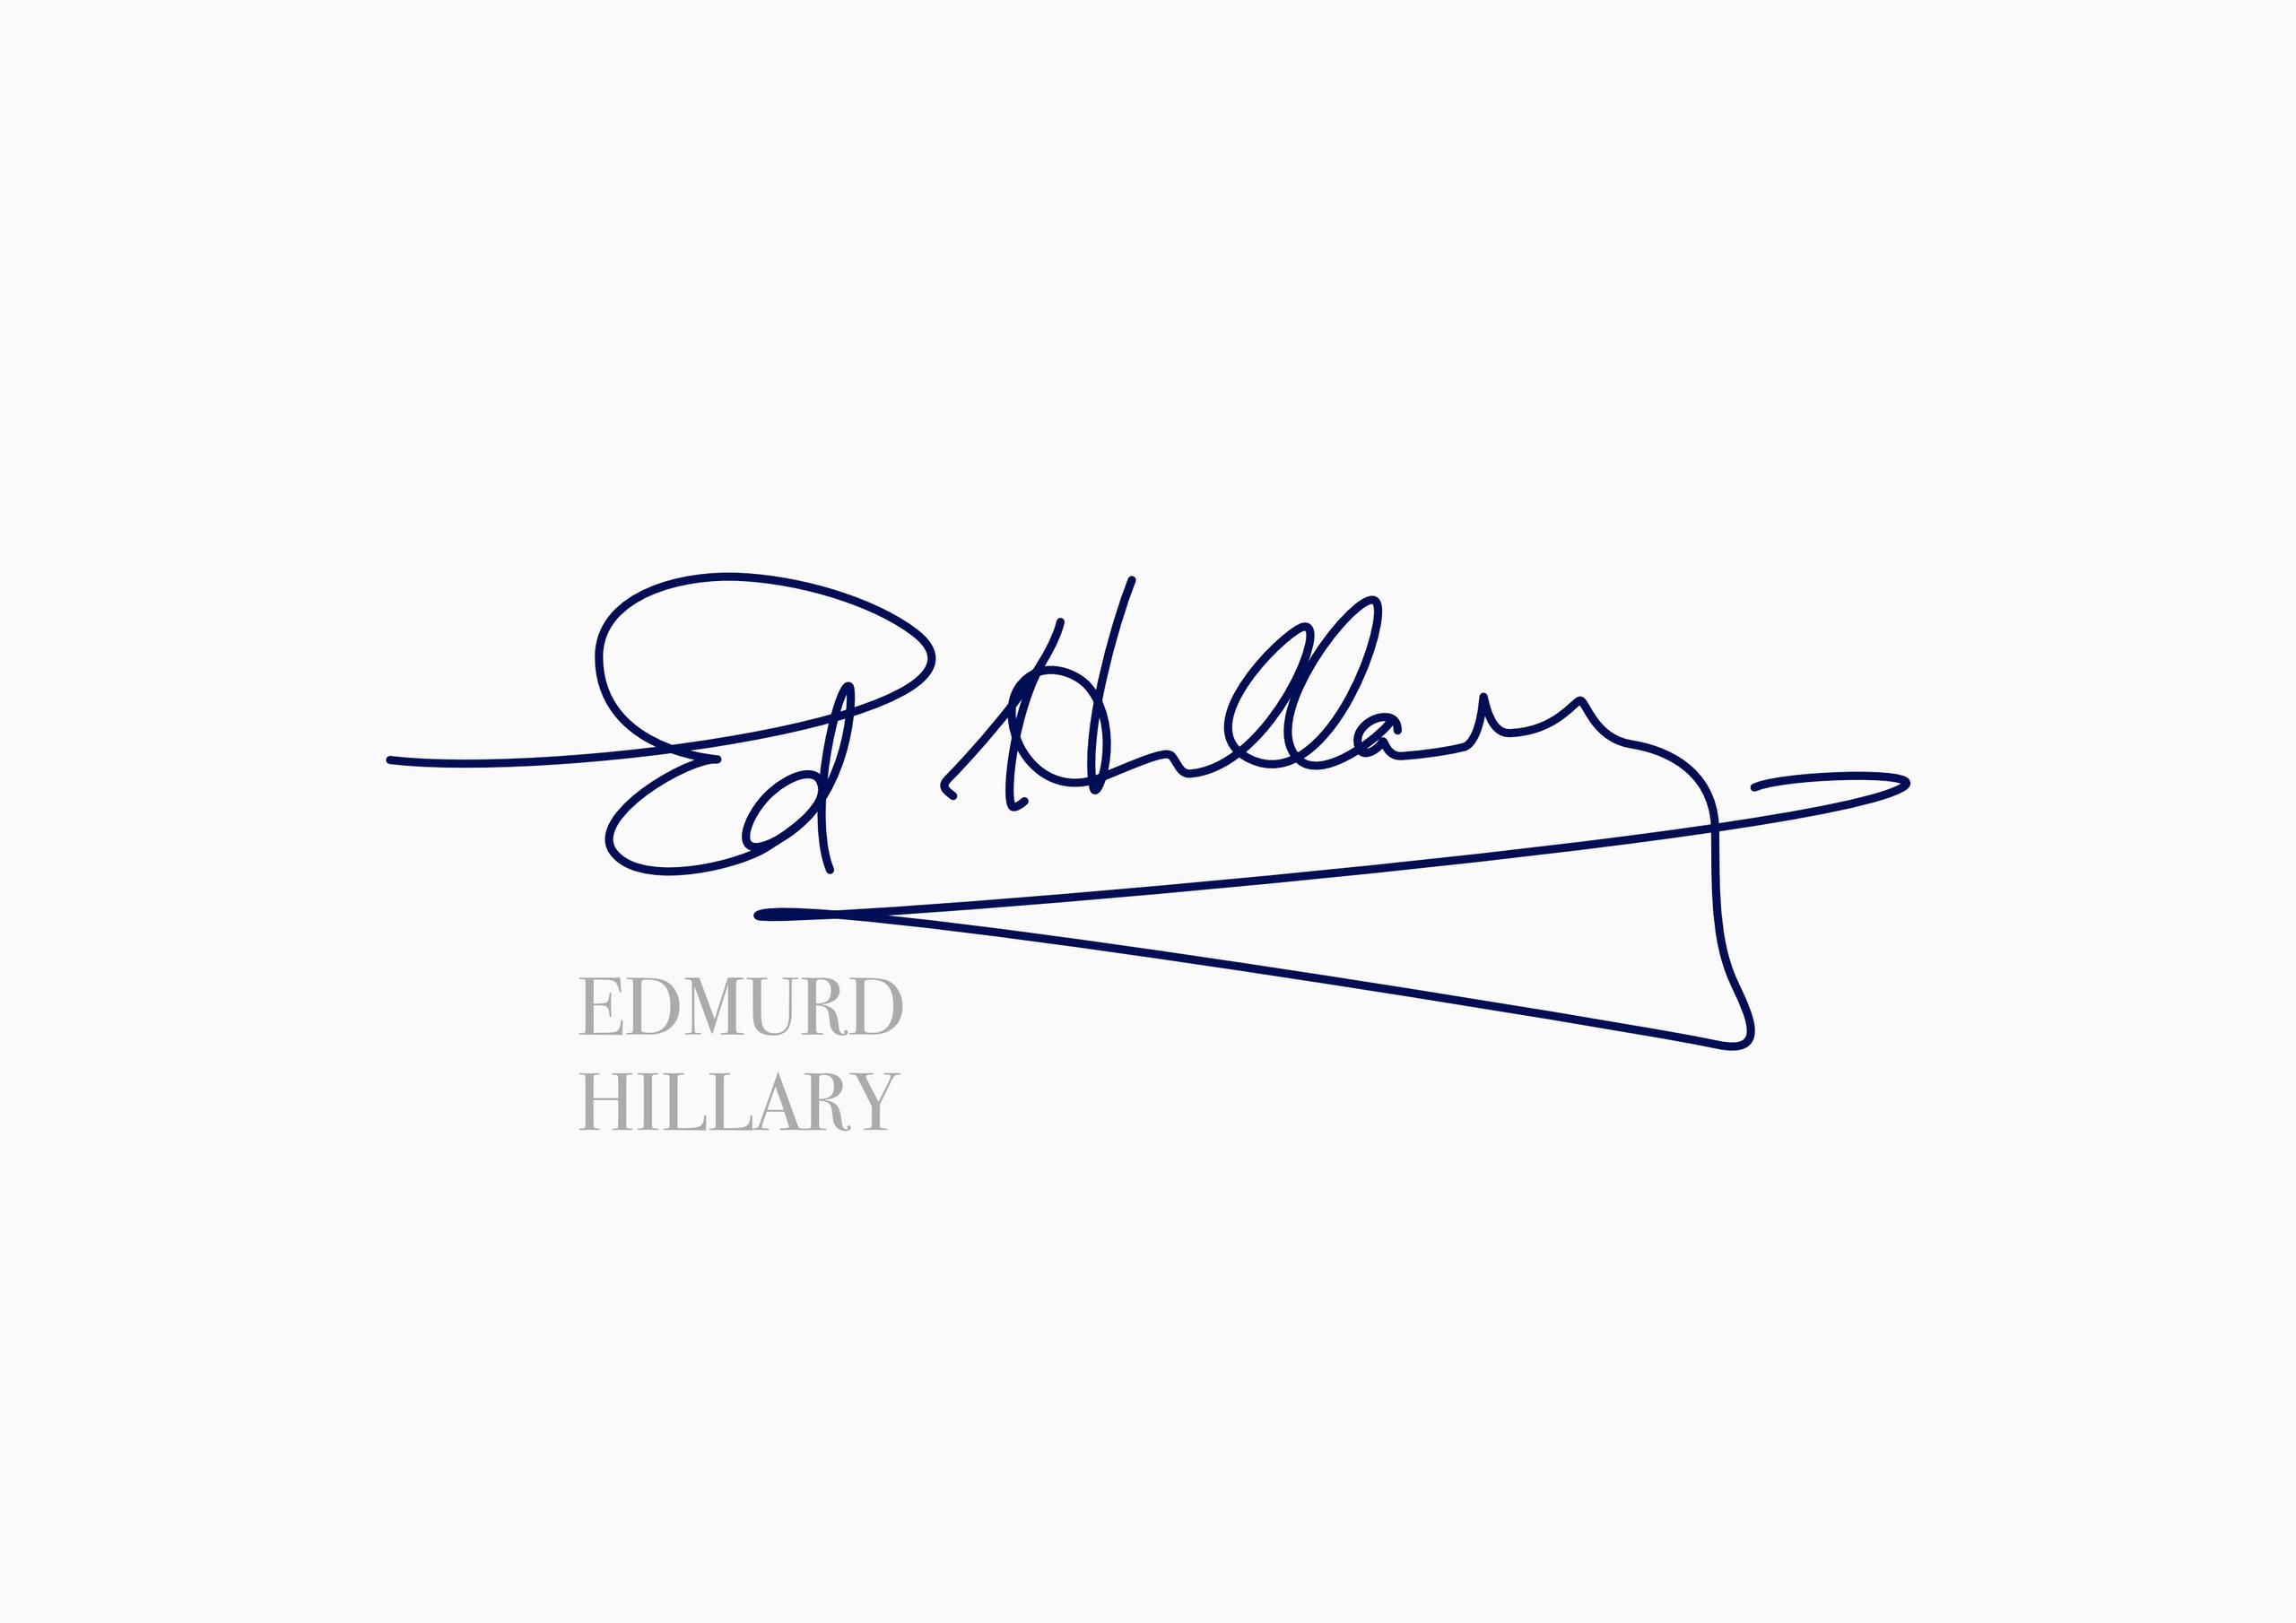 edmund-hillary.png